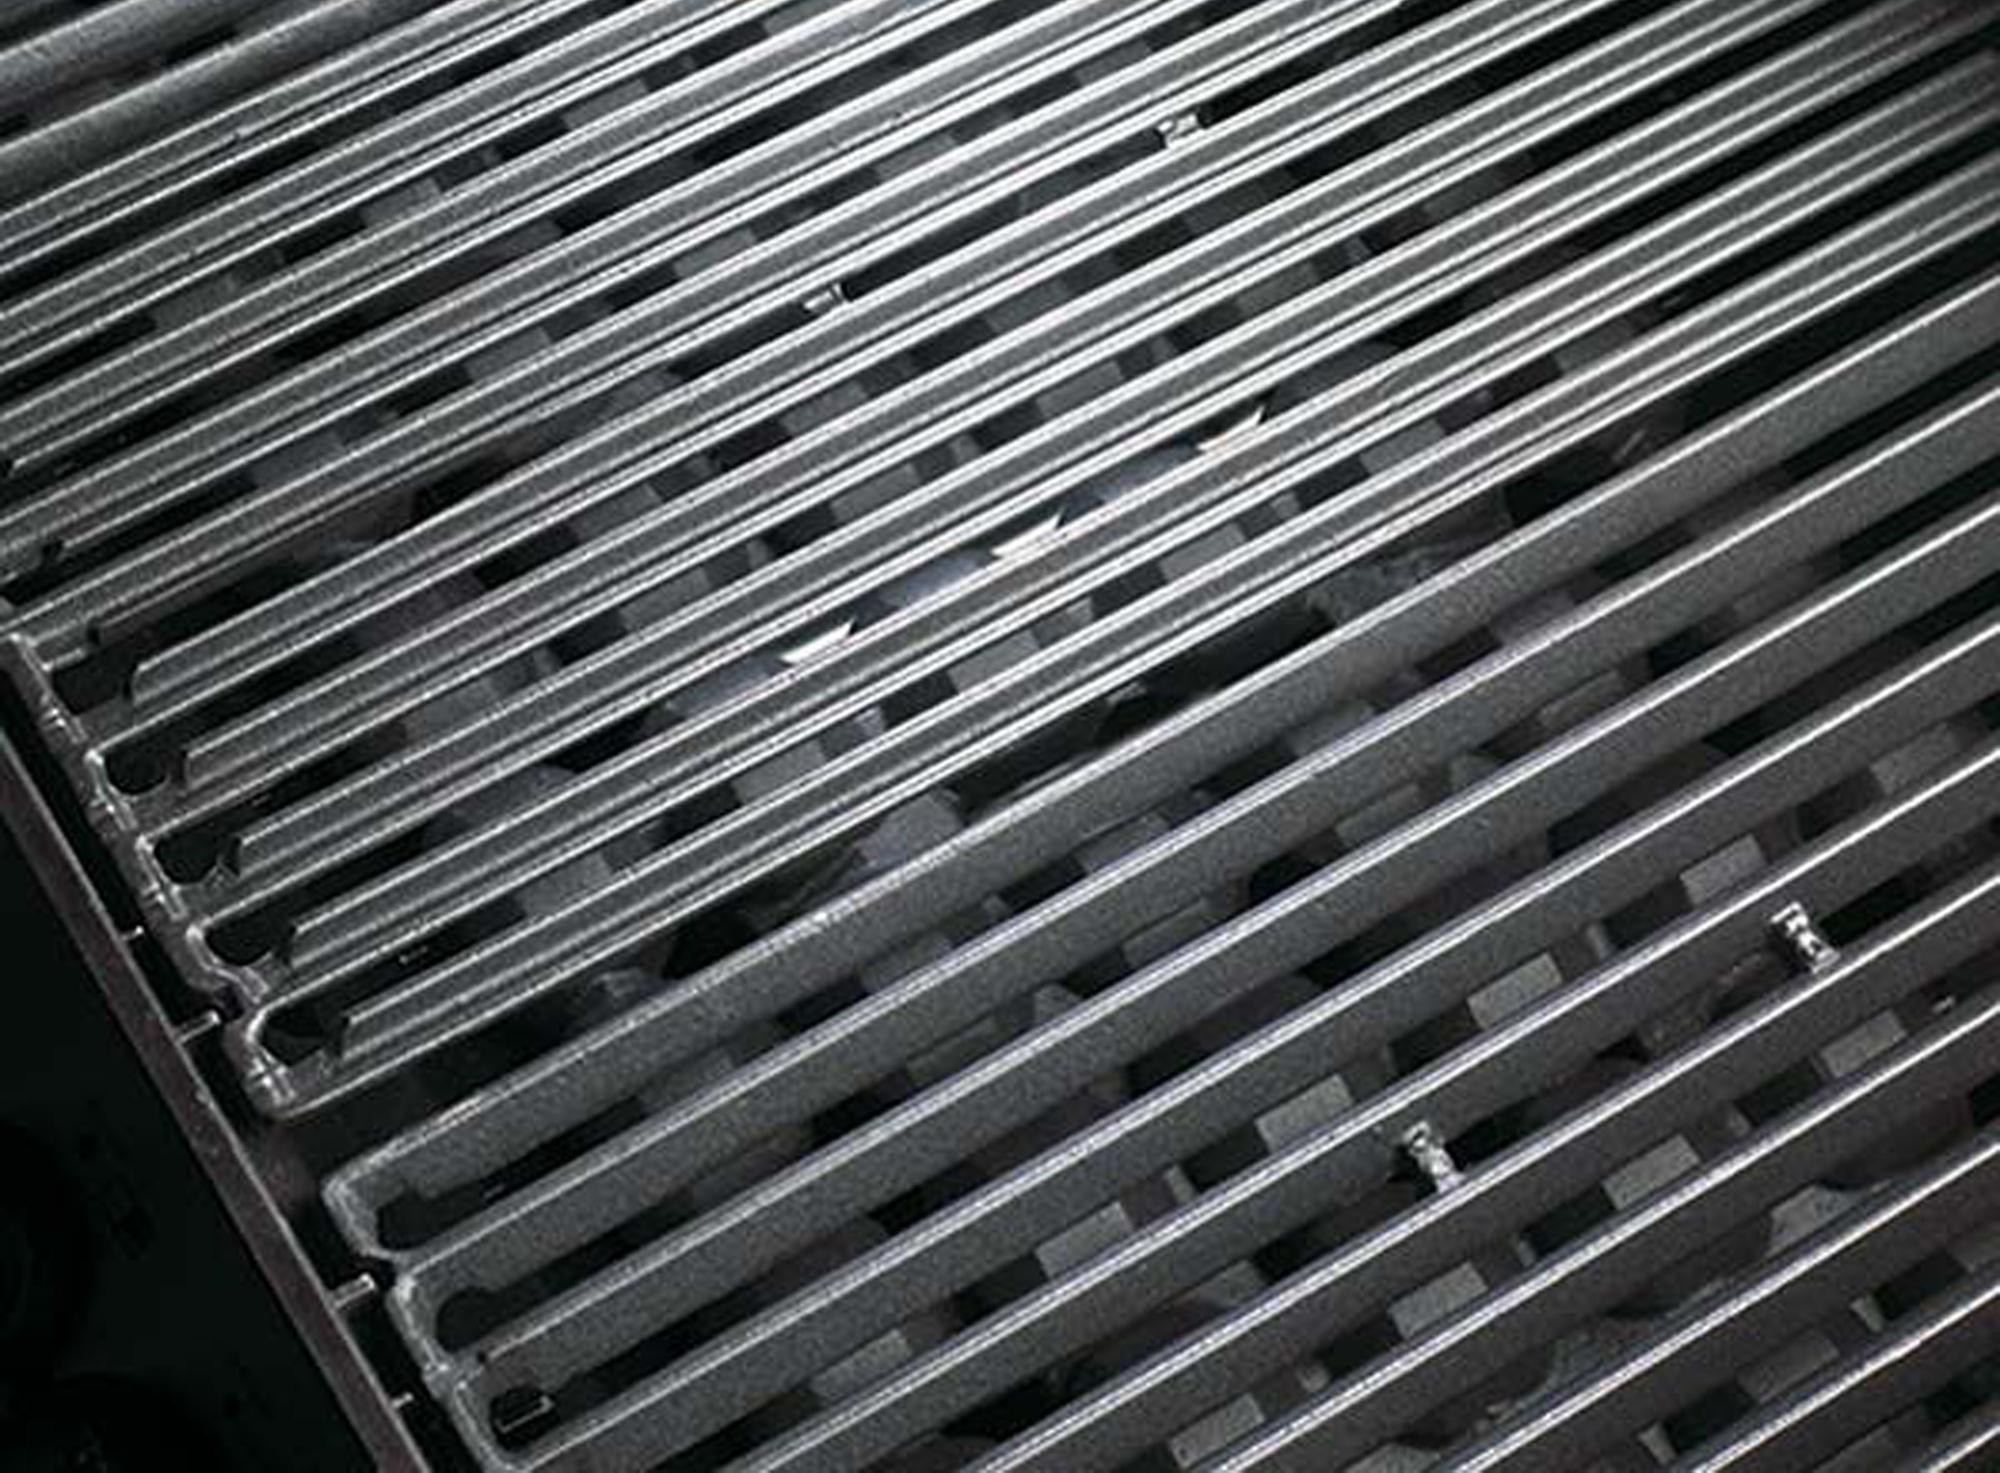 Weber Elektrogrill Rost Spülmaschine : Grillrost shop gusseisen oder edelstahl grillrost kaufen